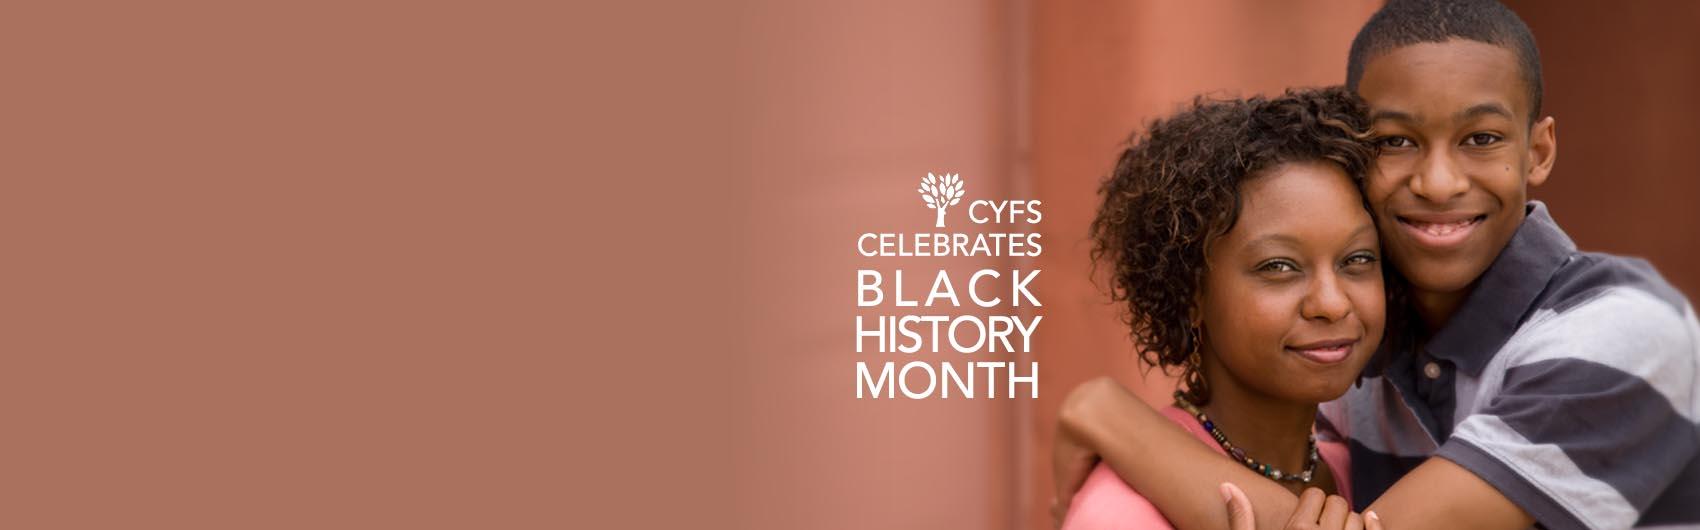 CYFS Celebrates Black History Month